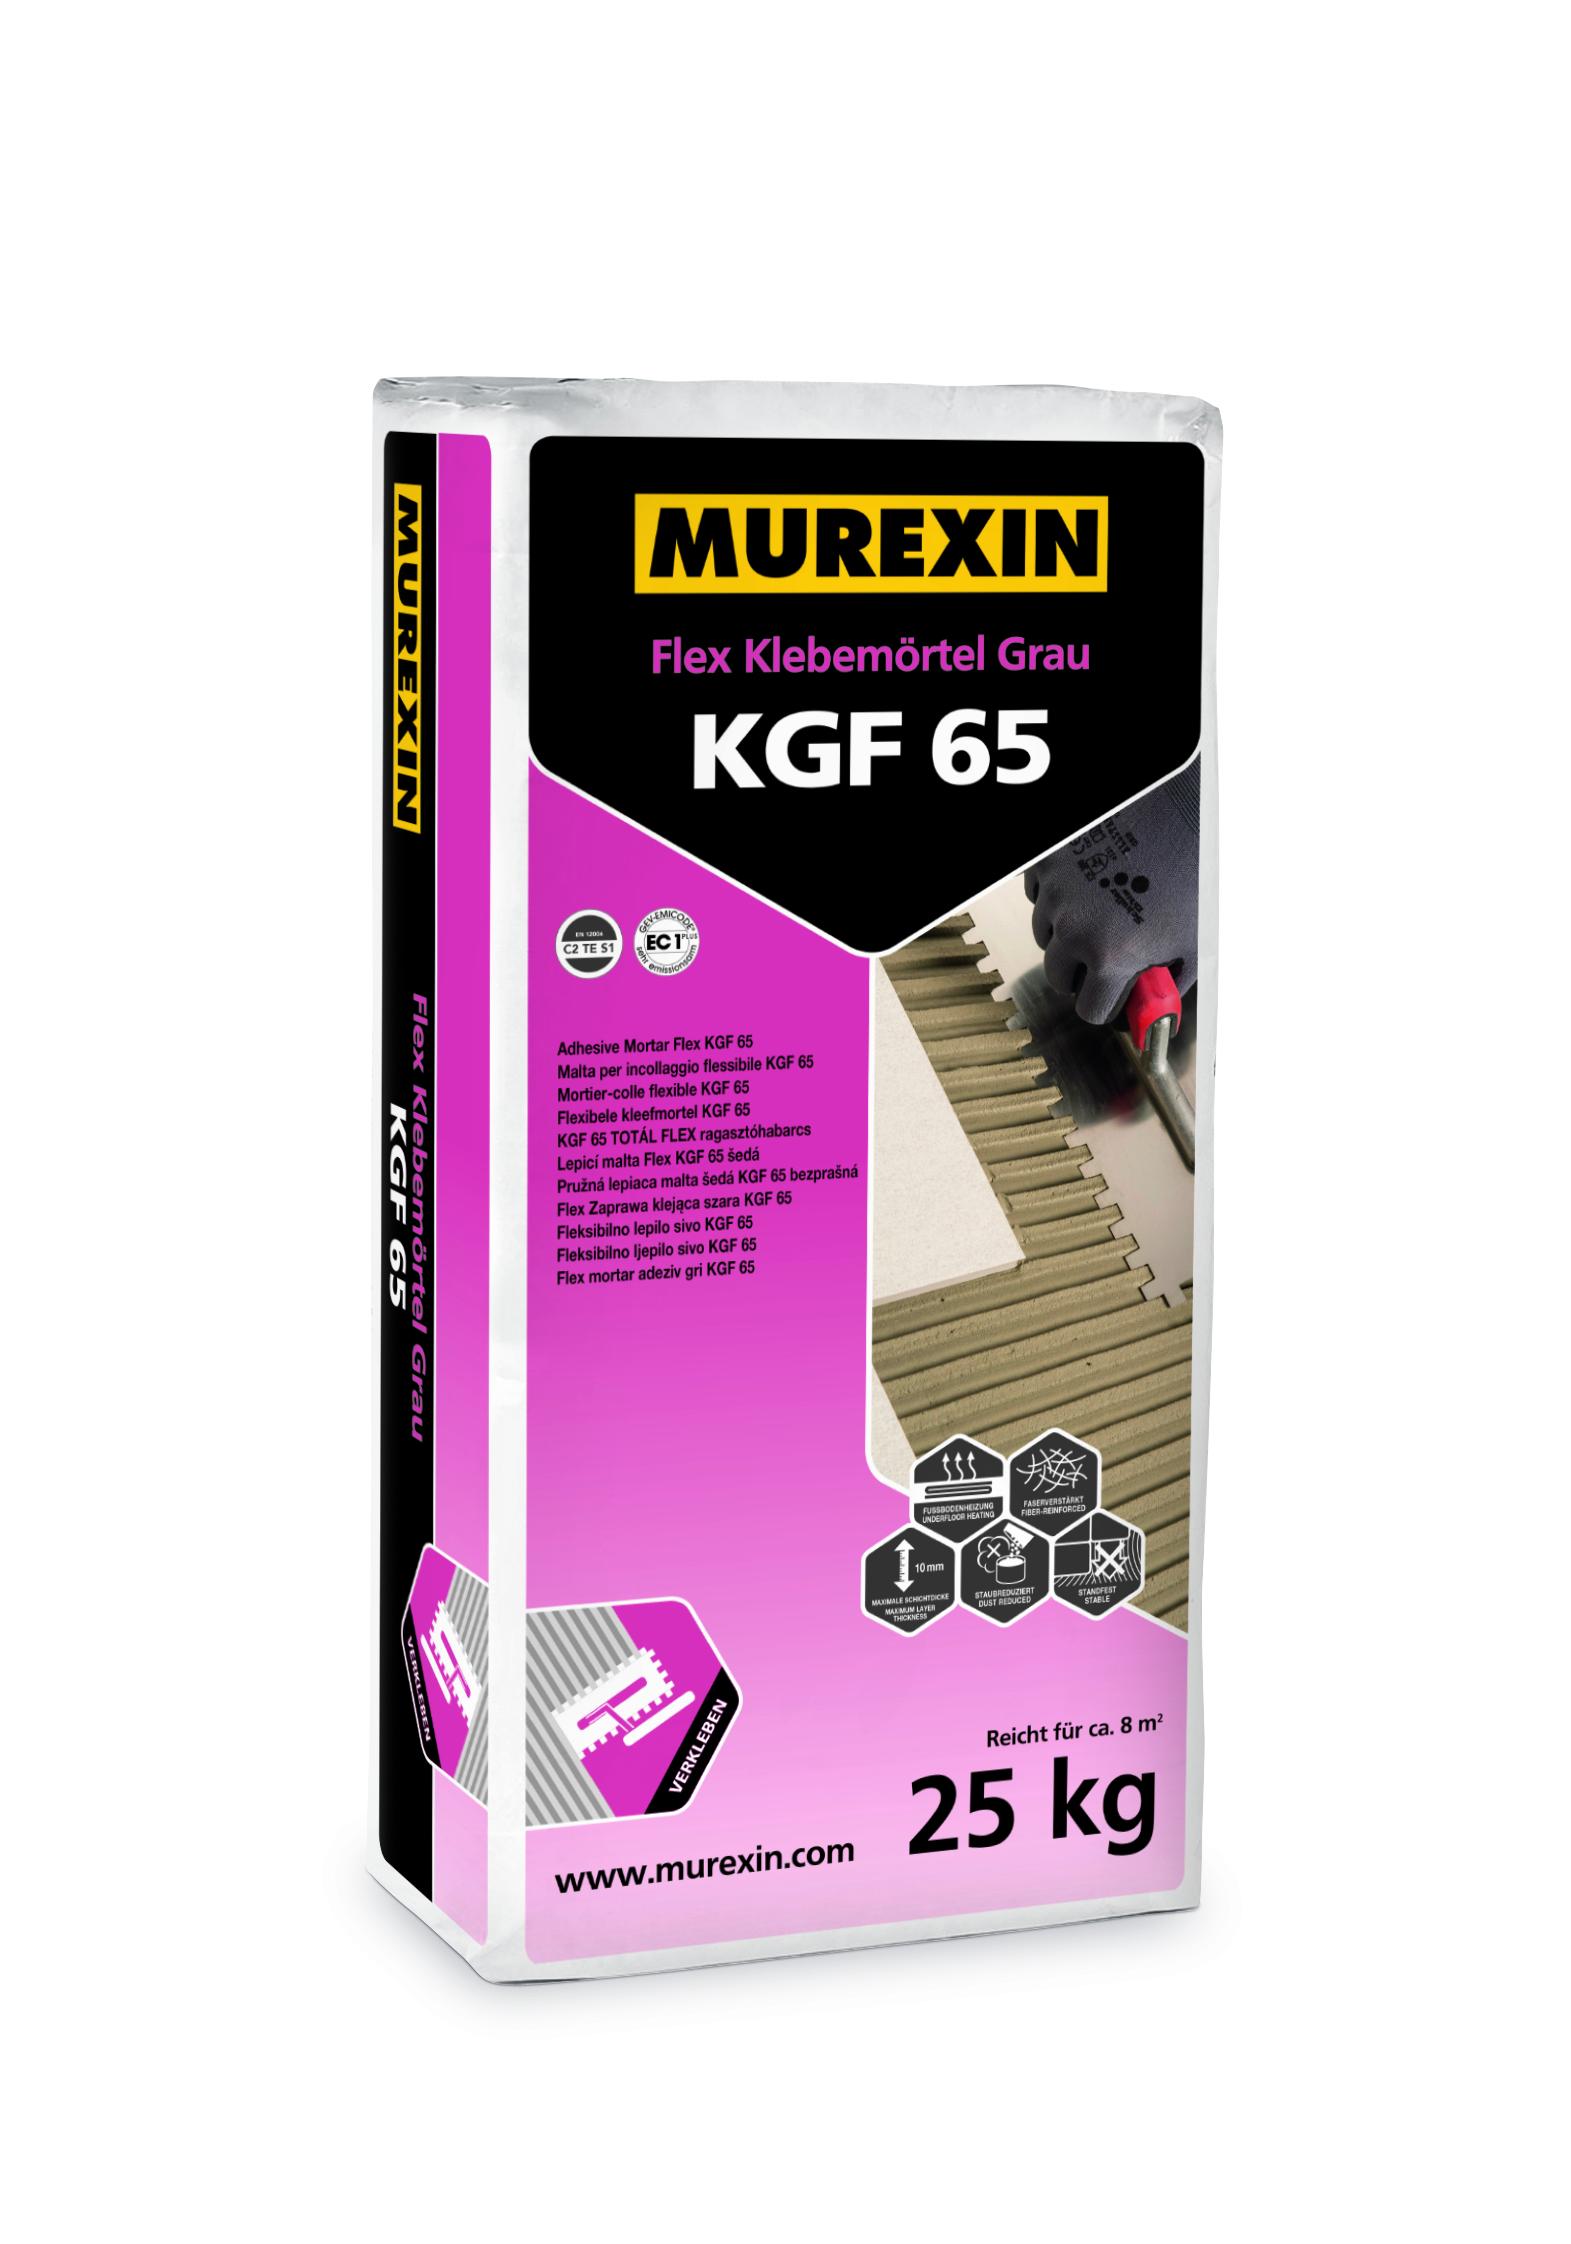 Murexin - Flex Klebemörtel Grau KGF 65 25kg